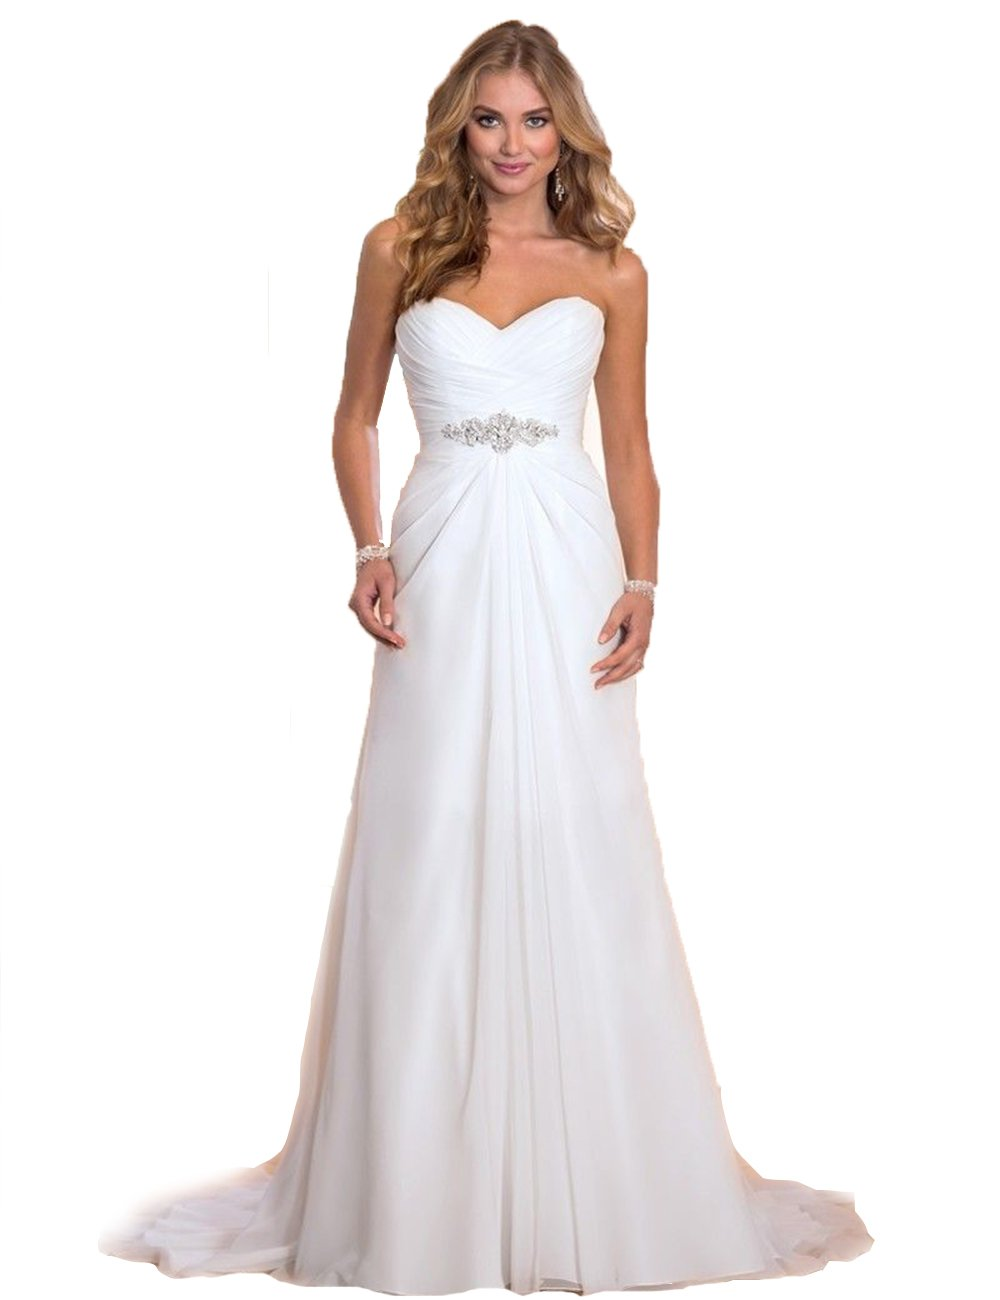 Elegantes Brautkleid TRAUM Hochzeitskleid A-Linie Gr. 34 36 38 40 42 ...